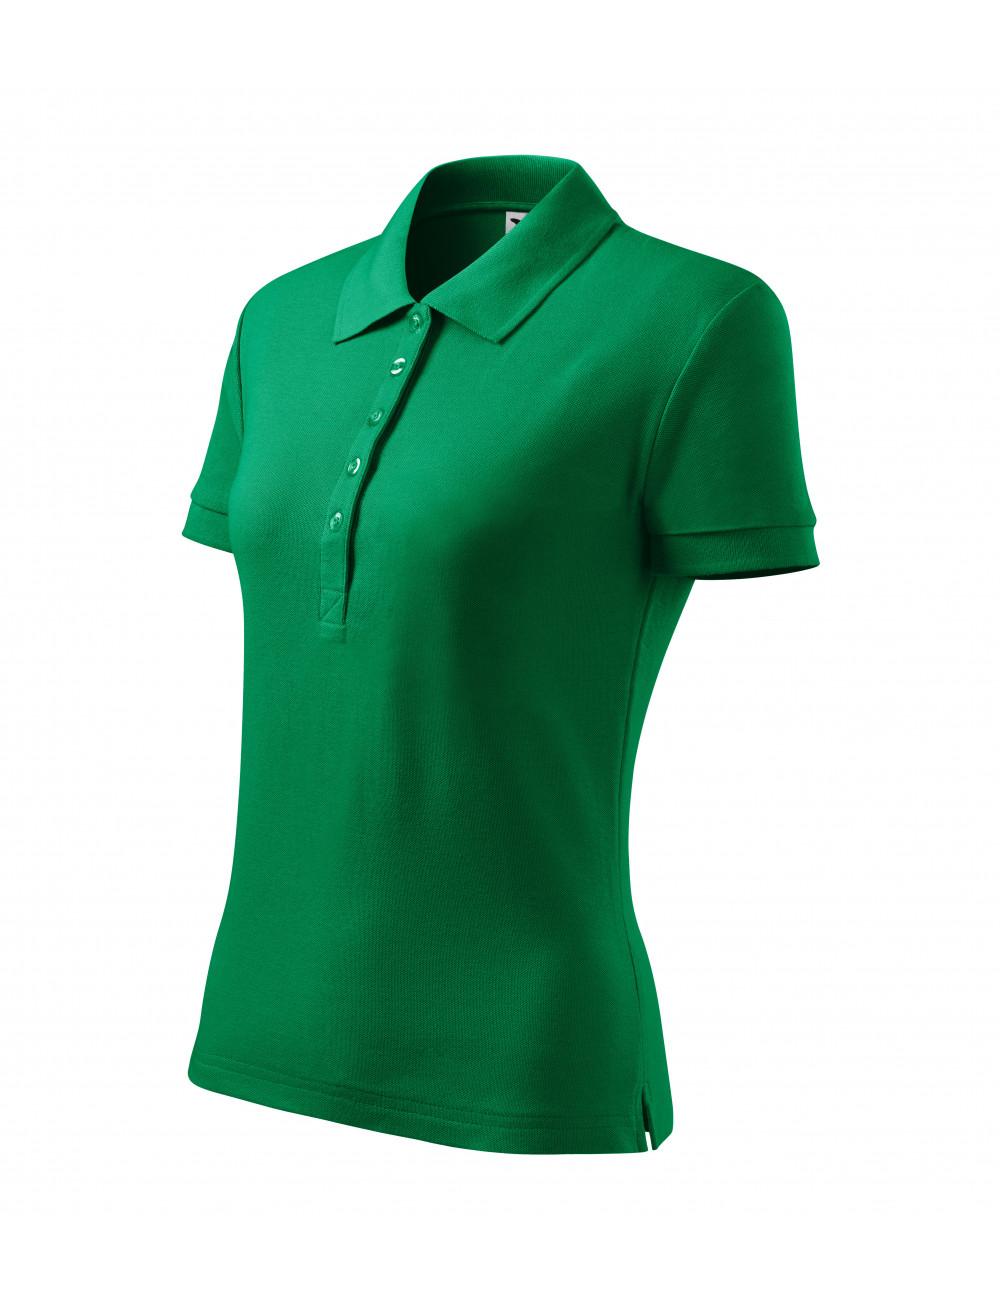 Adler MALFINI Koszulka polo damska Cotton Heavy 216 zieleń trawy